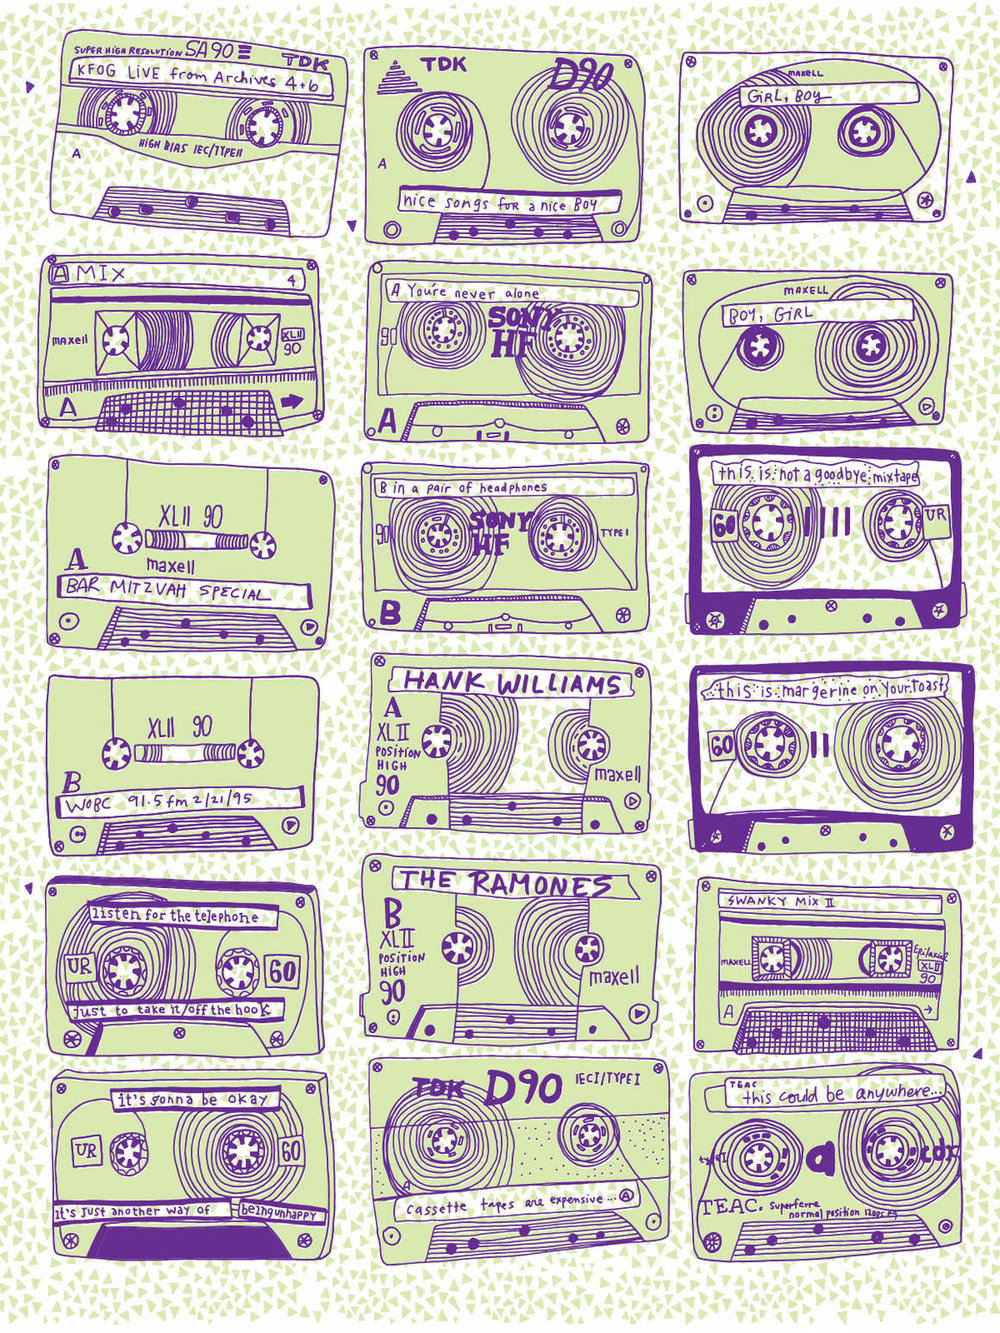 kate-bingaman-burt-mixtape-v2-print-MAIN-563a4d59aa3a8-1160.jpg